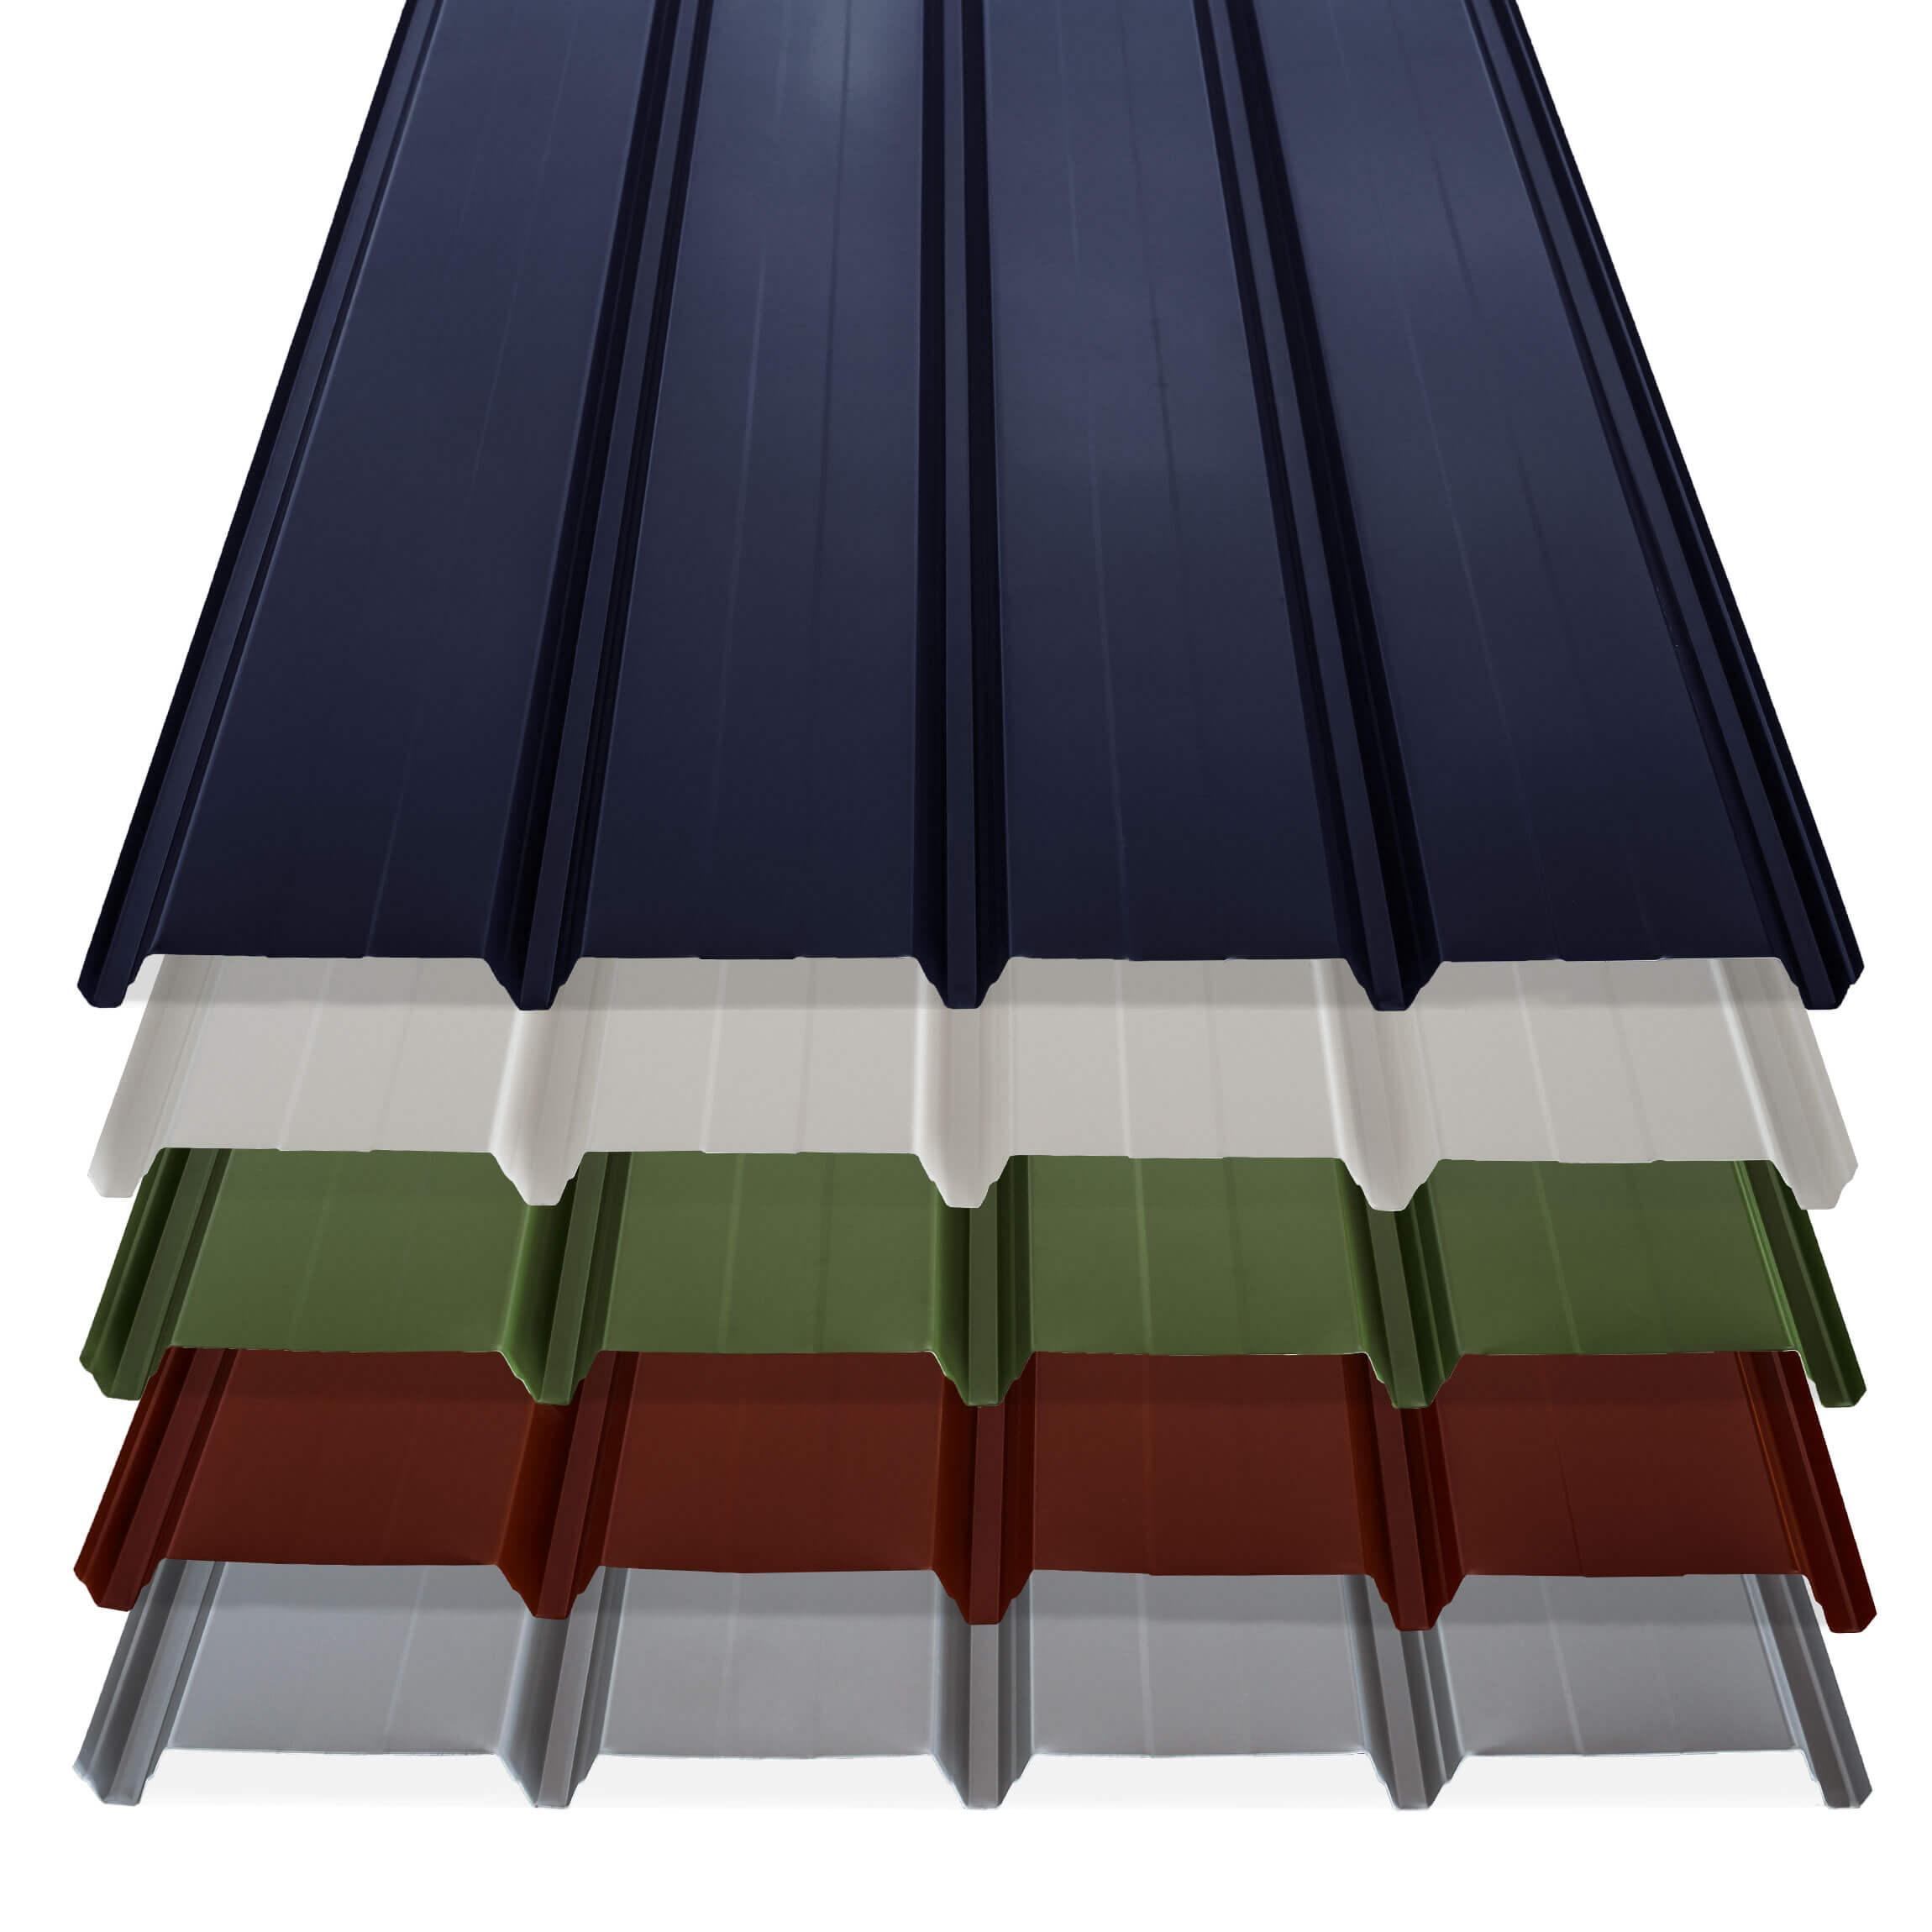 tole bac pr laqu e au cameroun r novation toiture. Black Bedroom Furniture Sets. Home Design Ideas